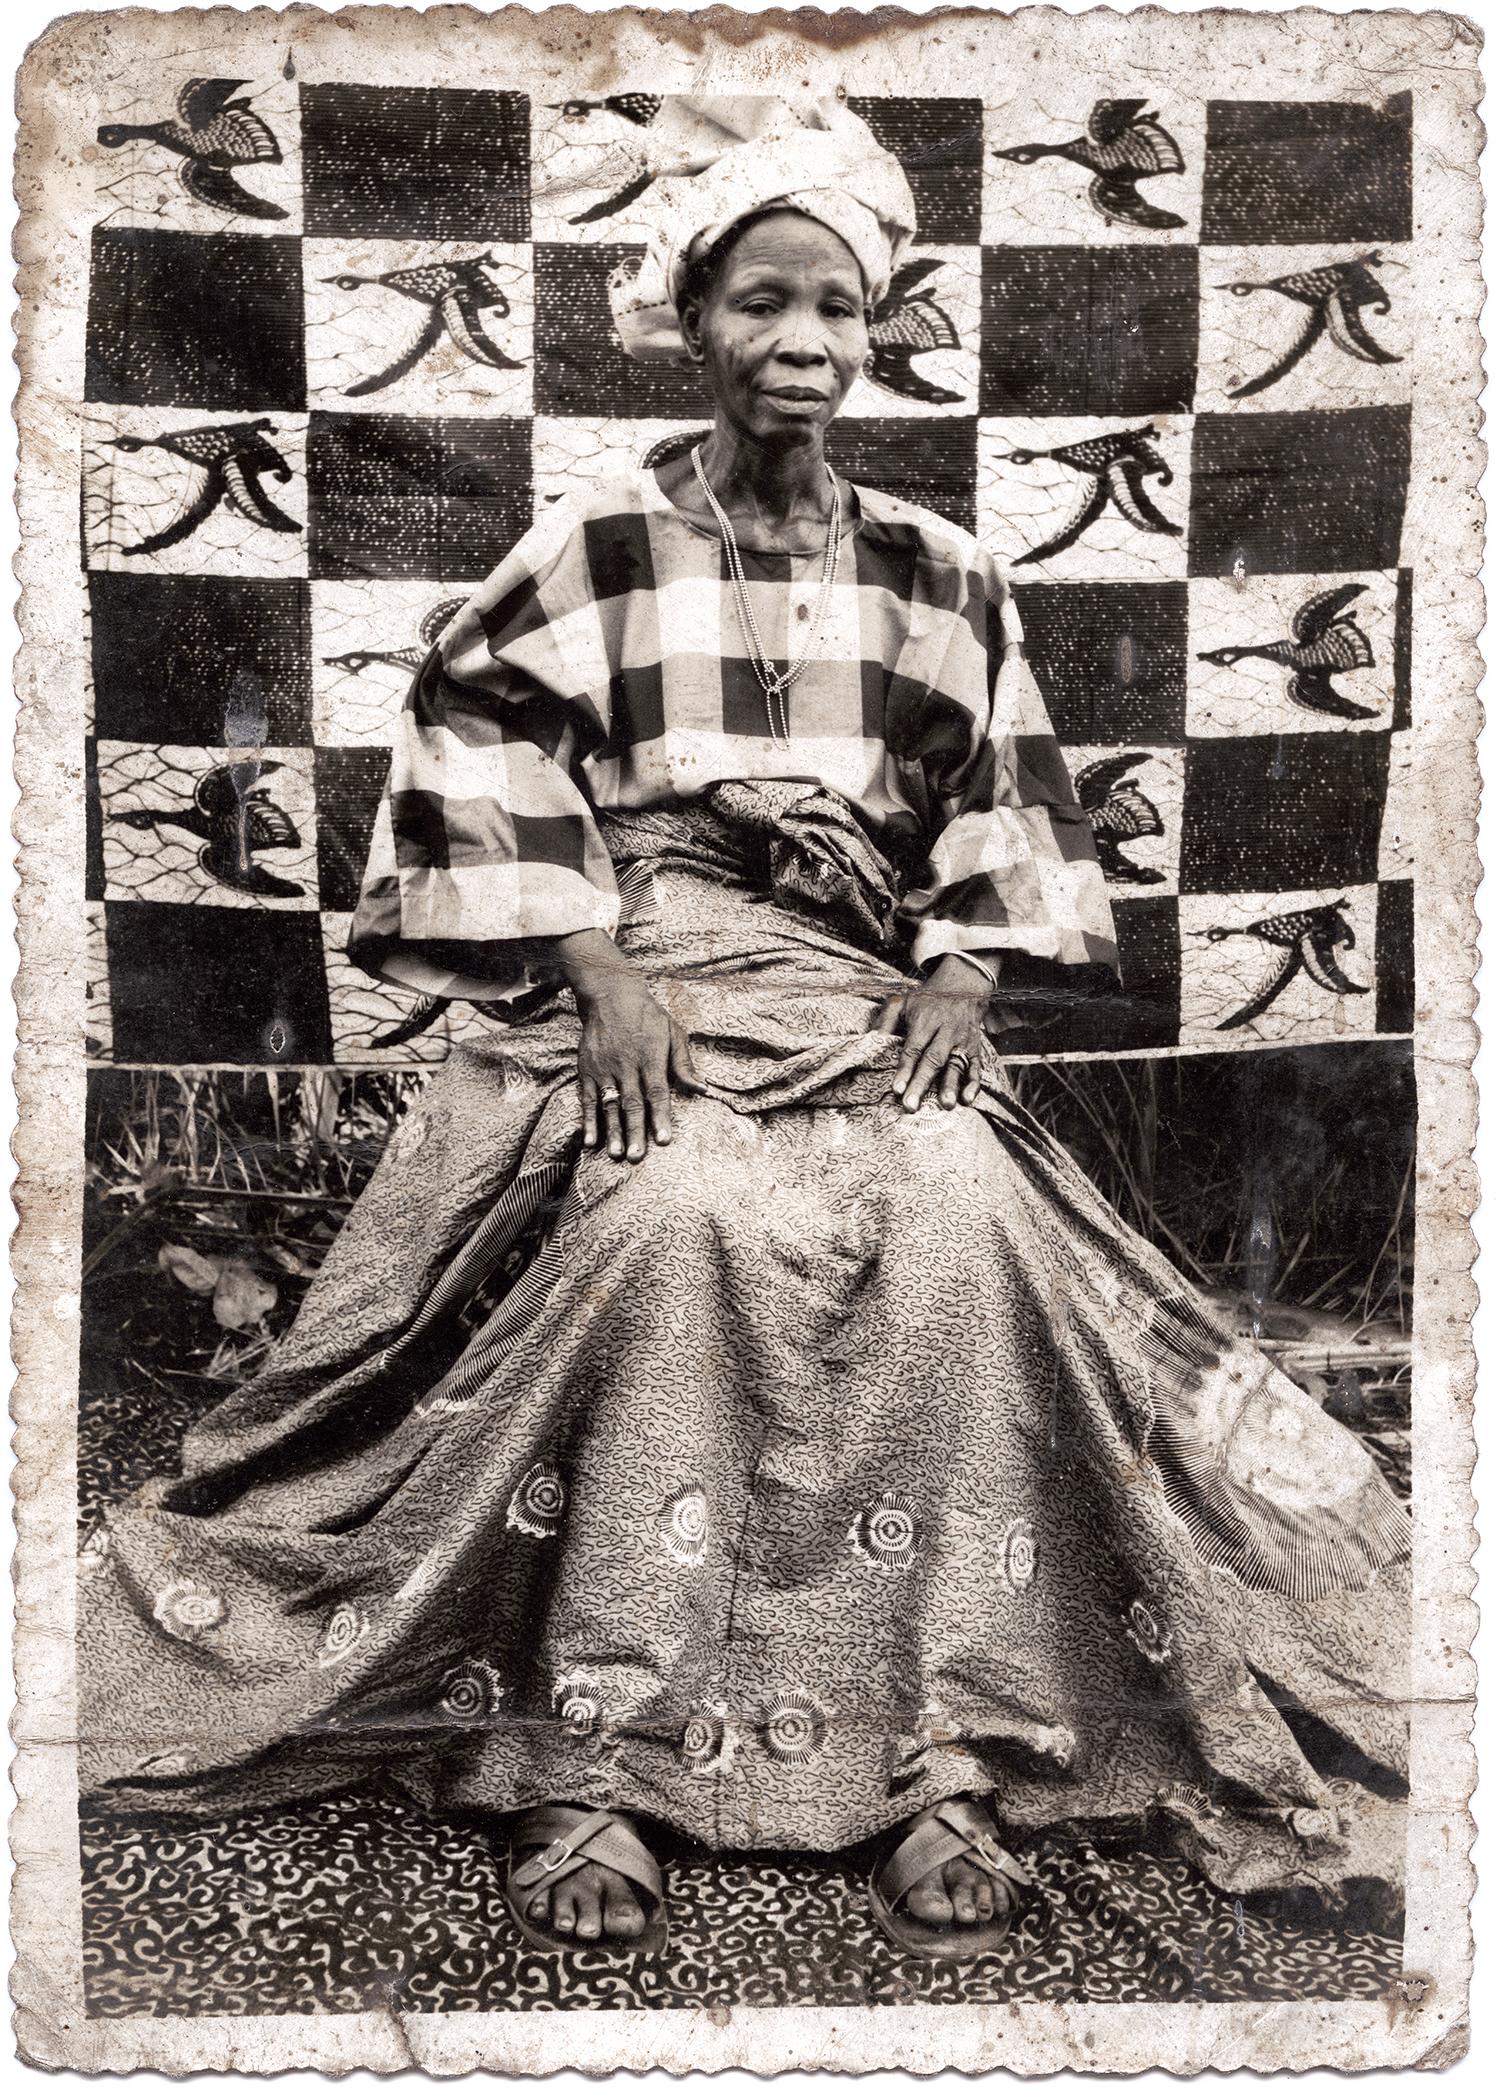 © photo Joseph Moïse Agbojelou, vintage, Porto Novo, Benin ca. 1960